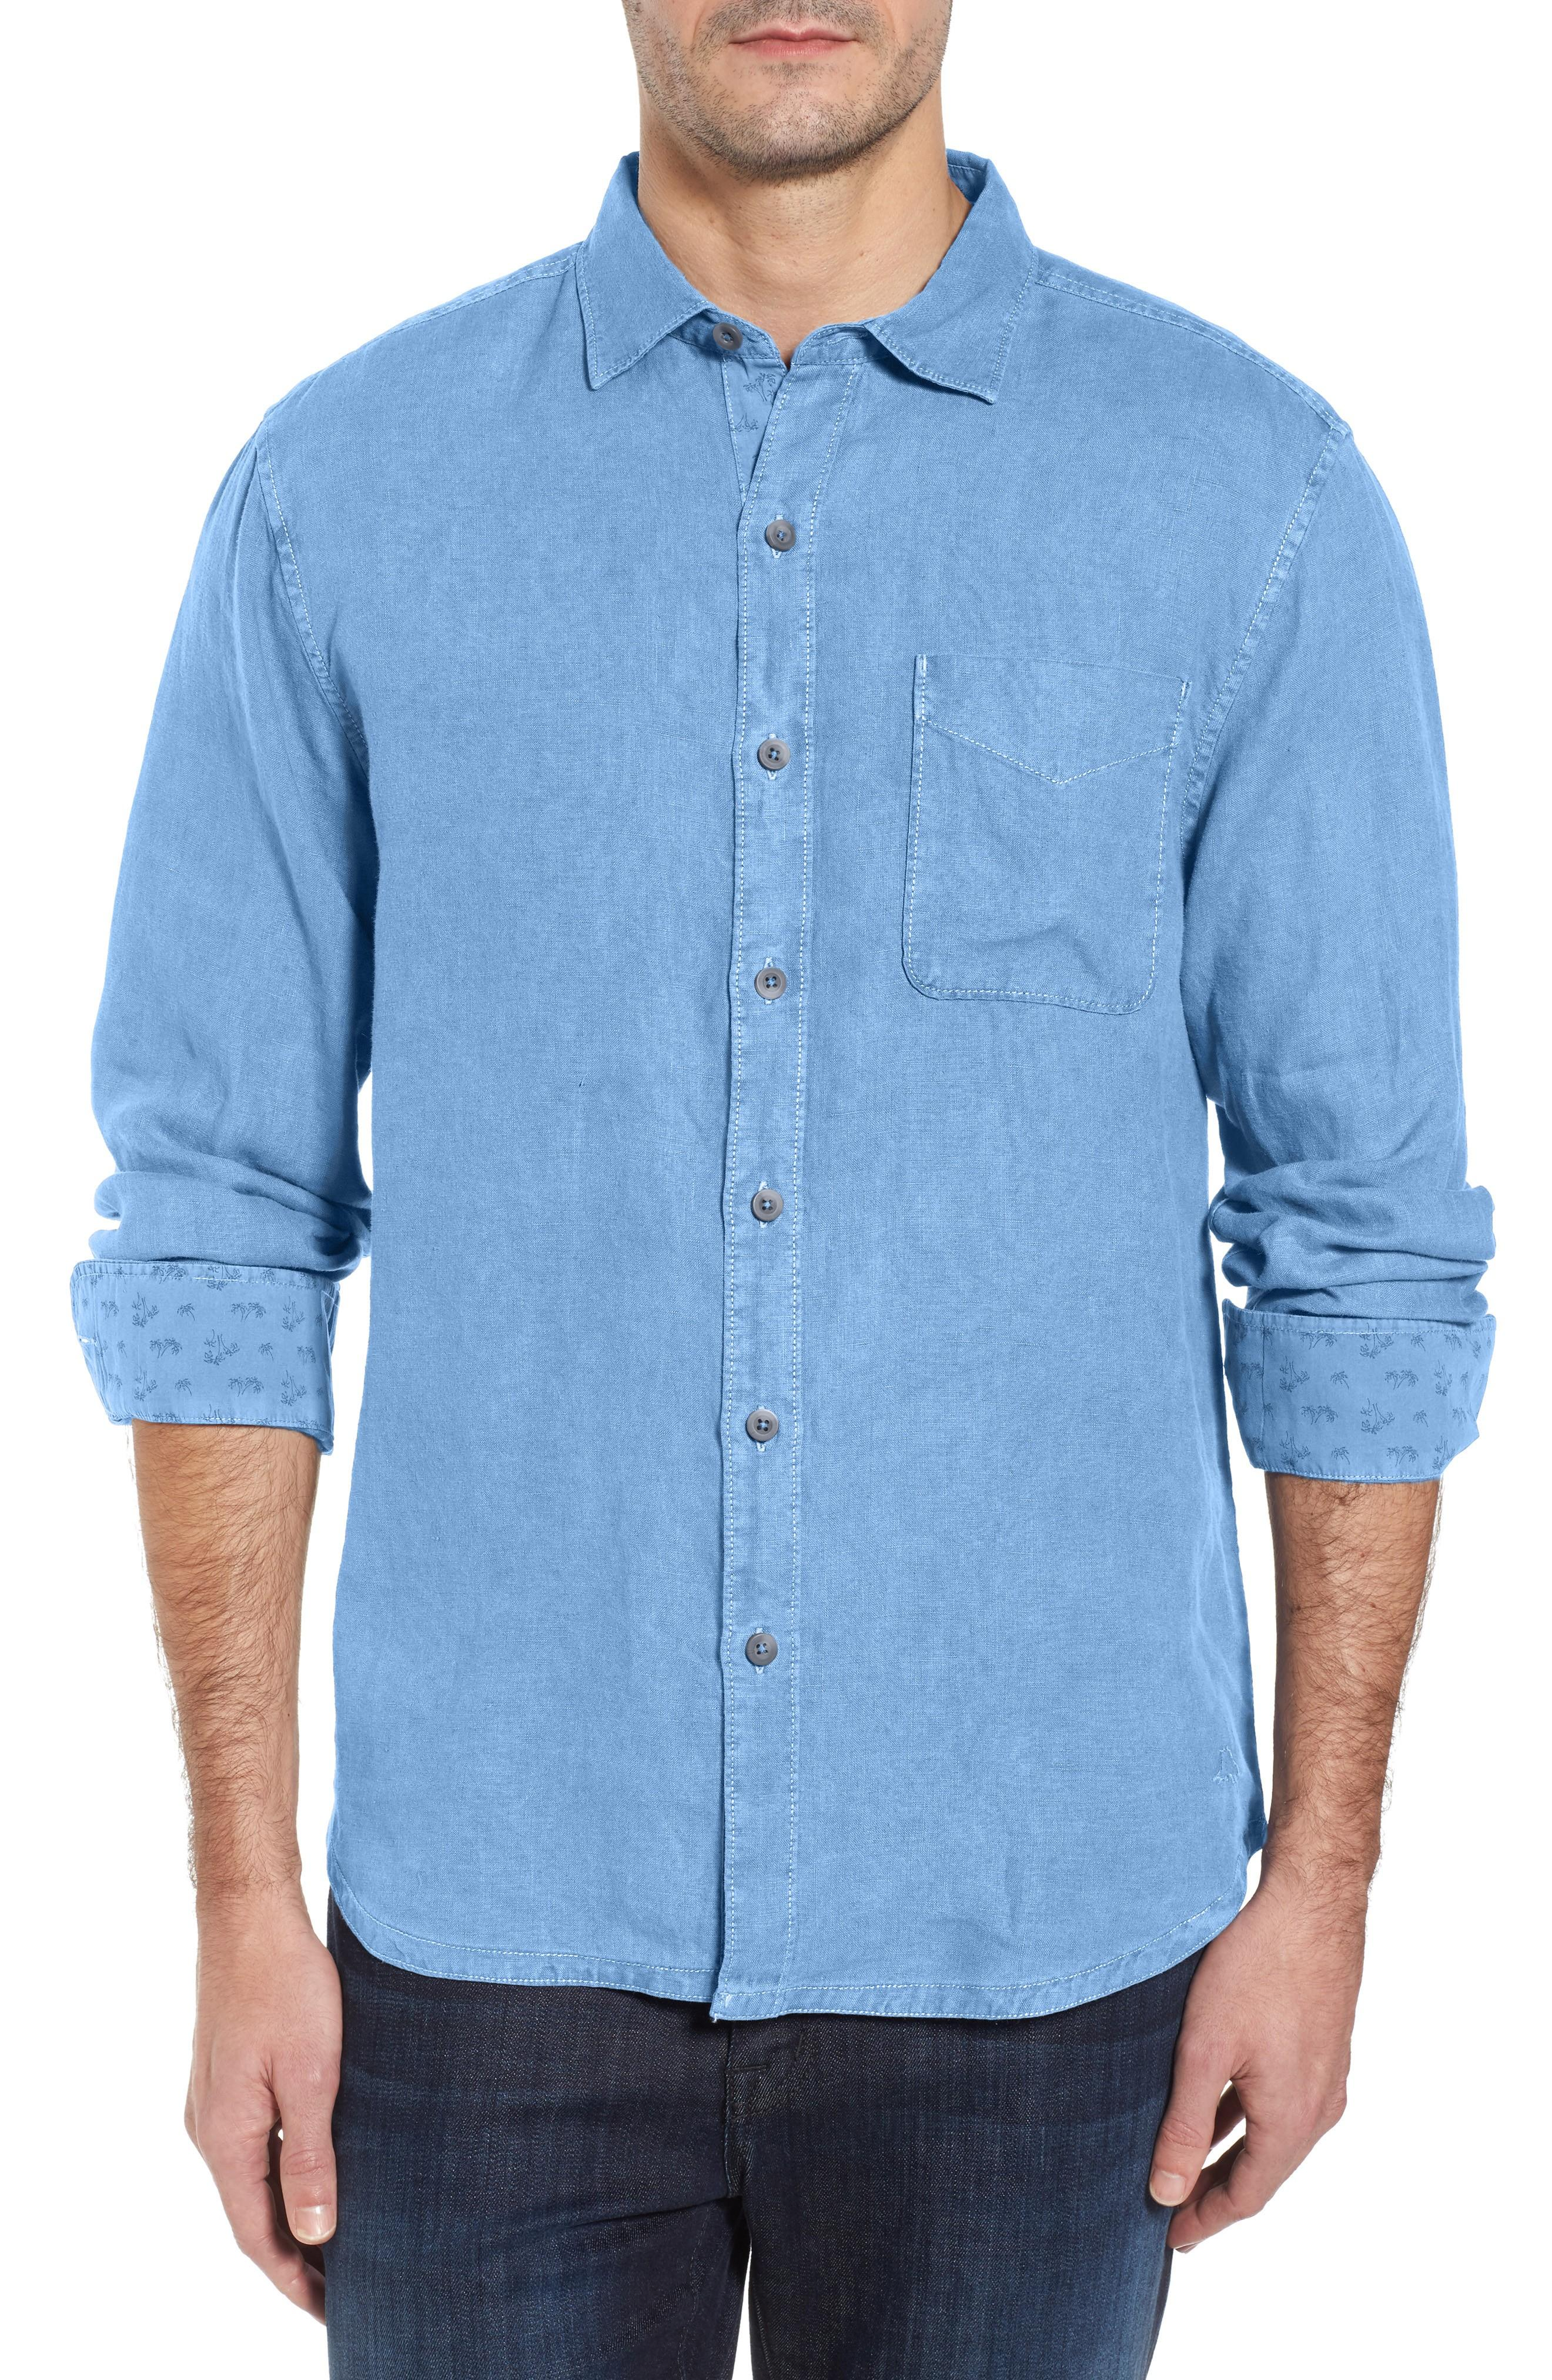 3b2b8e7d Tommy Bahama Seaspray Breezer Linen Shirt In Blue Yonder | ModeSens